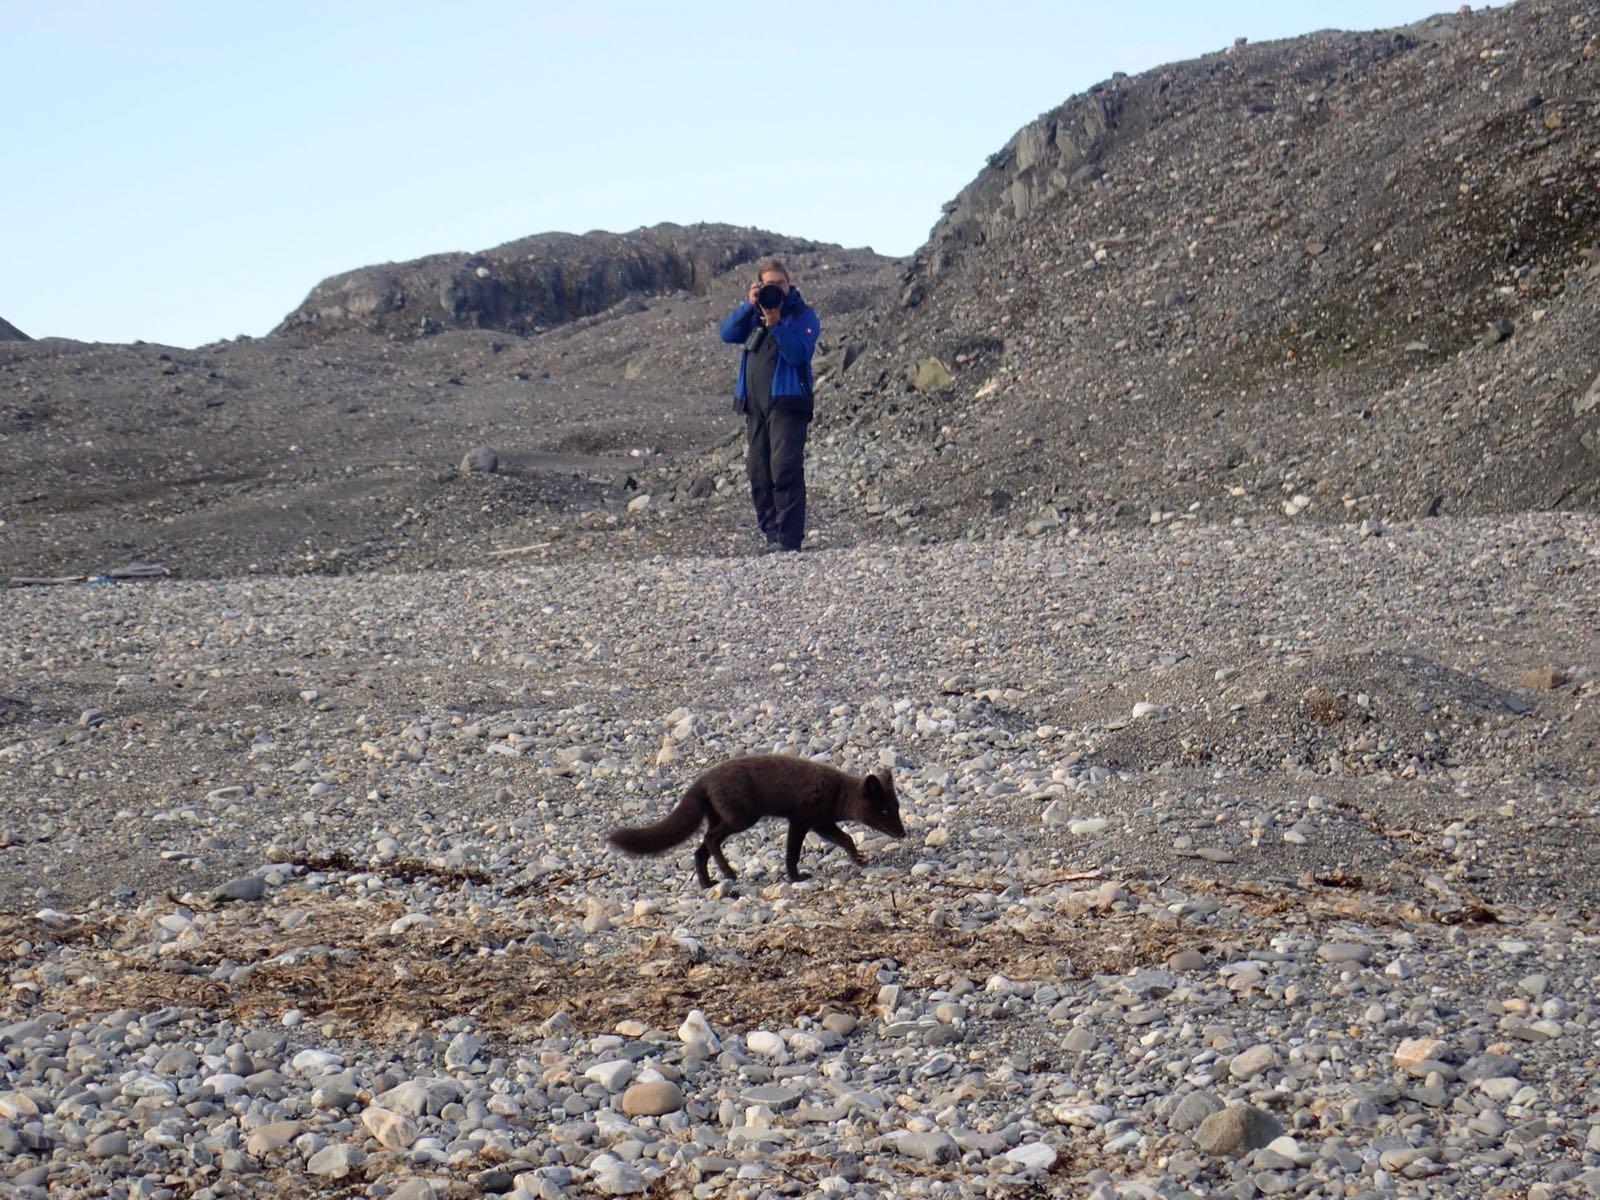 A curious Arctic fox (photo by Martine van den Heuvel-Greve)